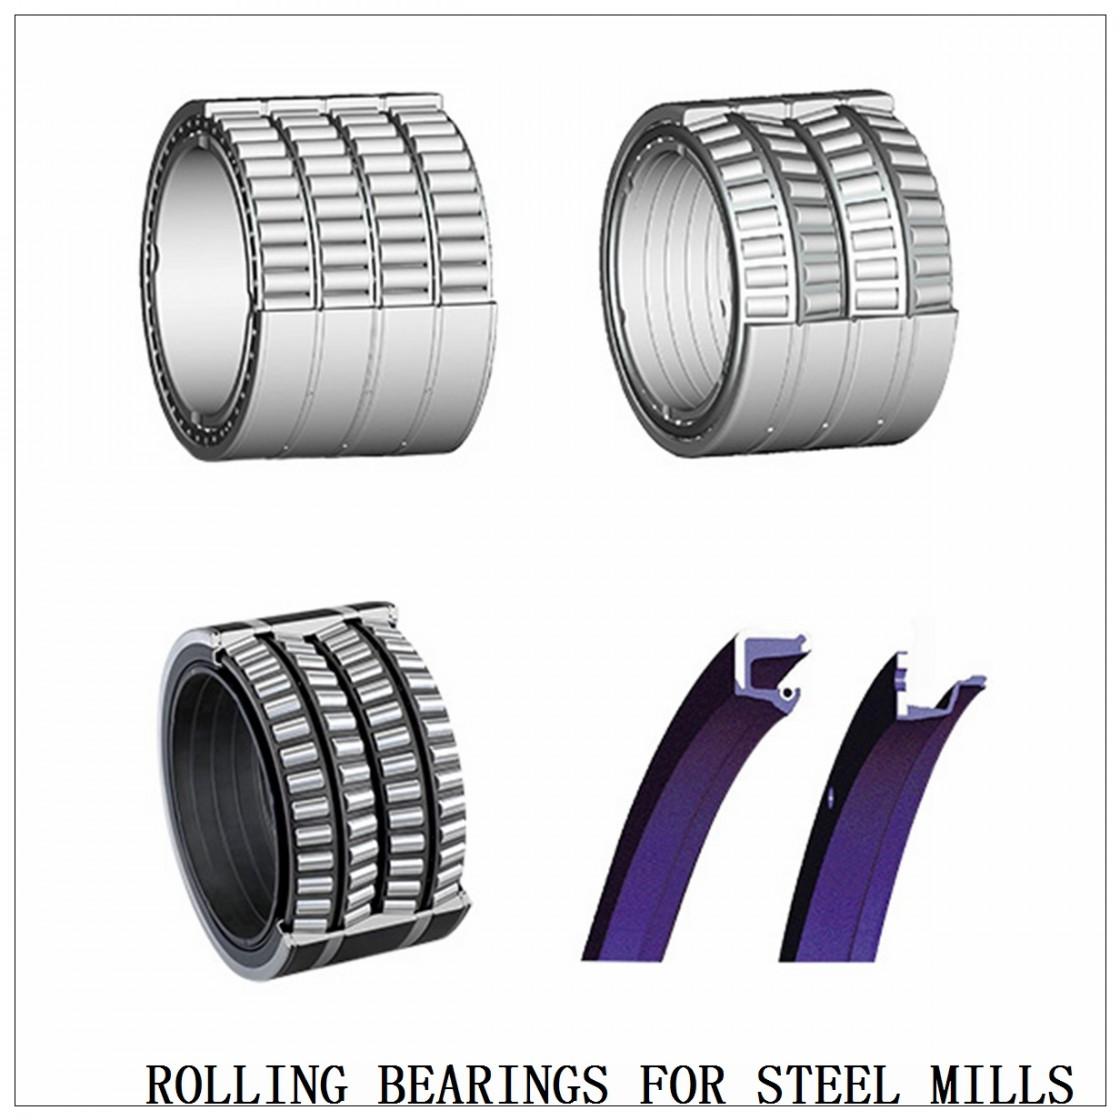 NSK M268749D-710-710D ROLLING BEARINGS FOR STEEL MILLS